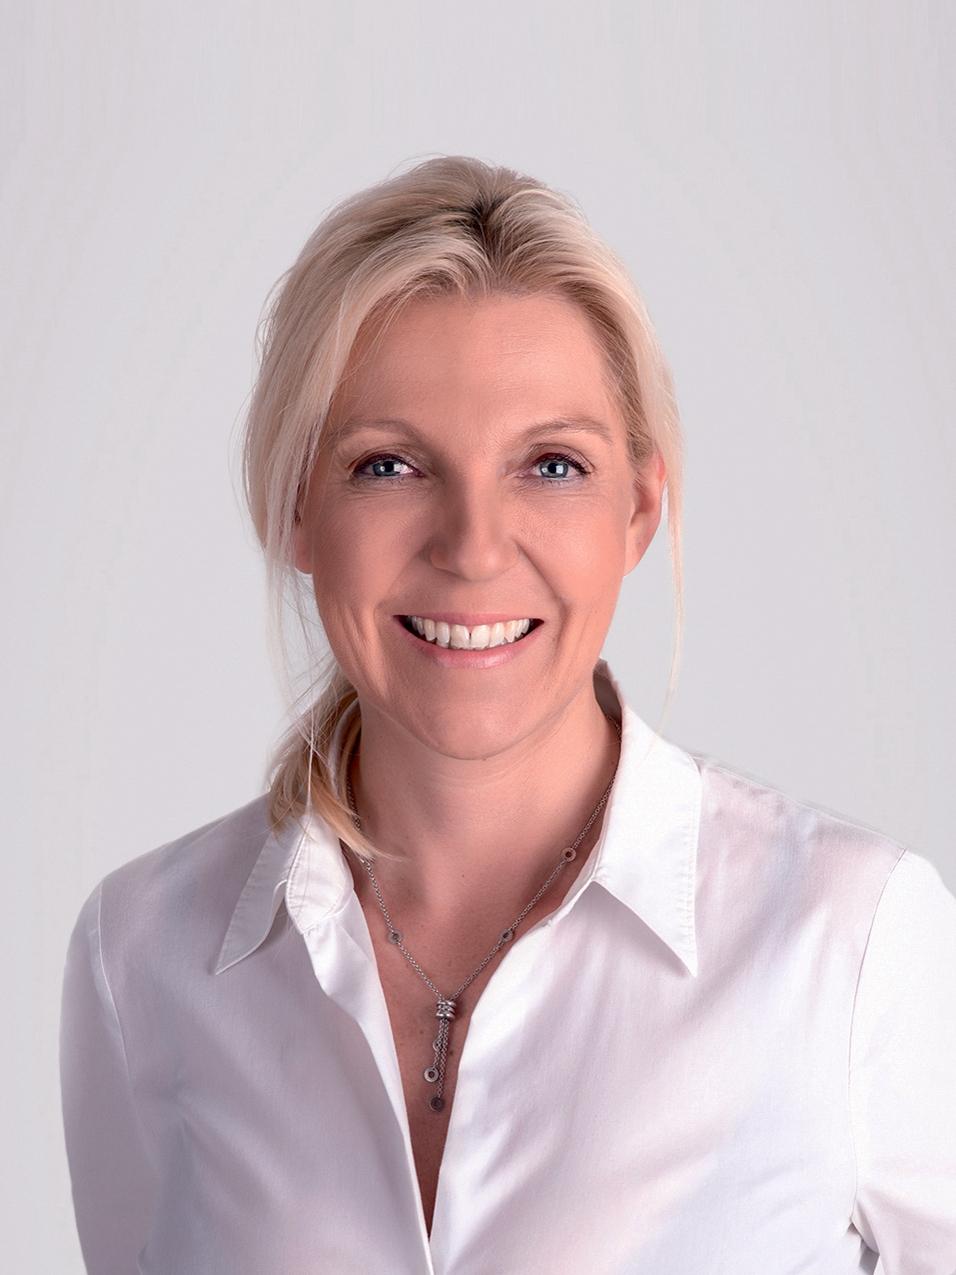 Carola Graul